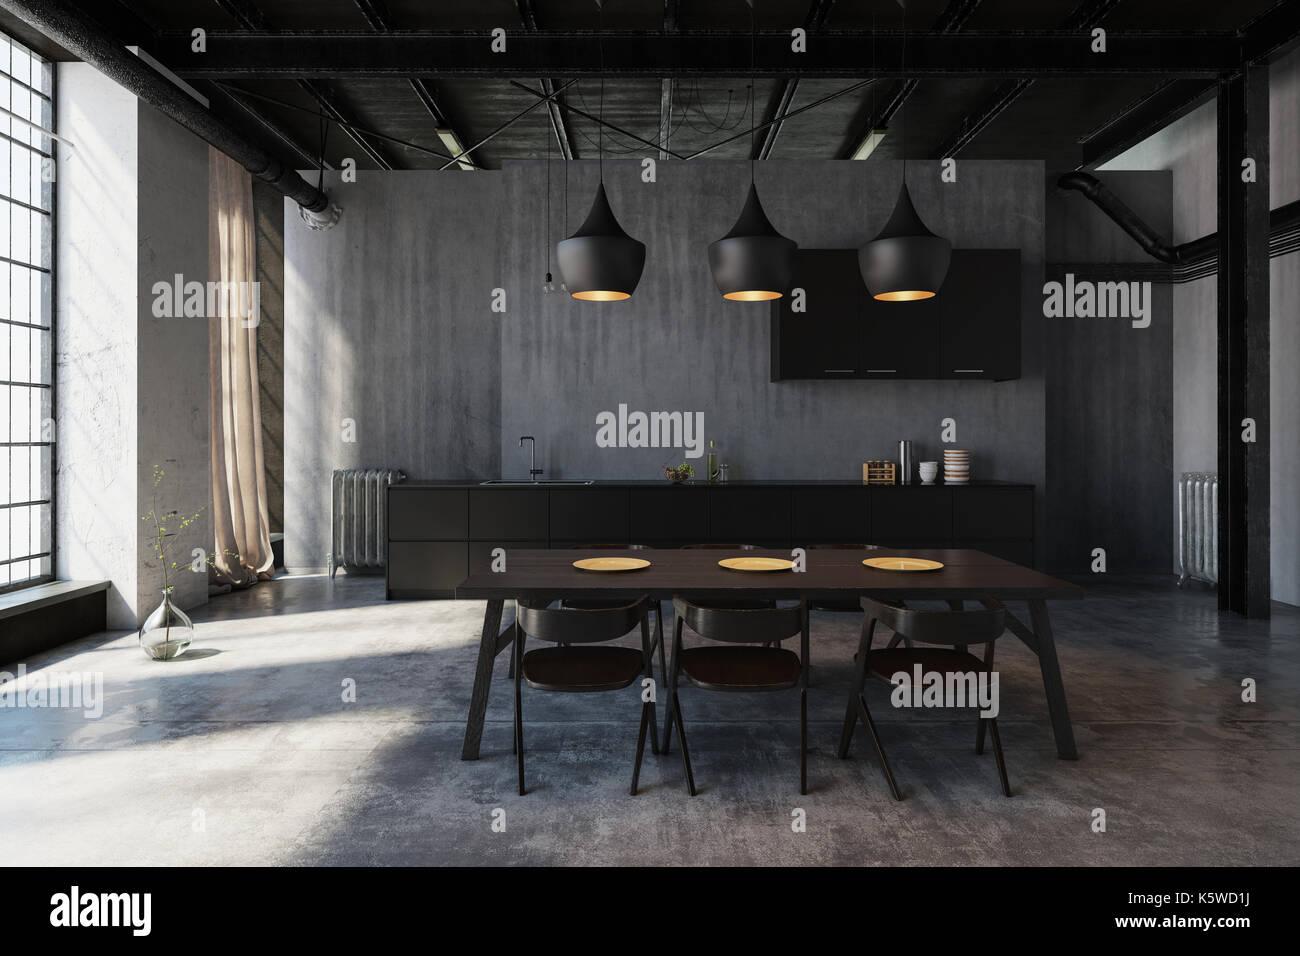 Hipster Moderne Salle à Manger Dans Un Loft Industriel Avec